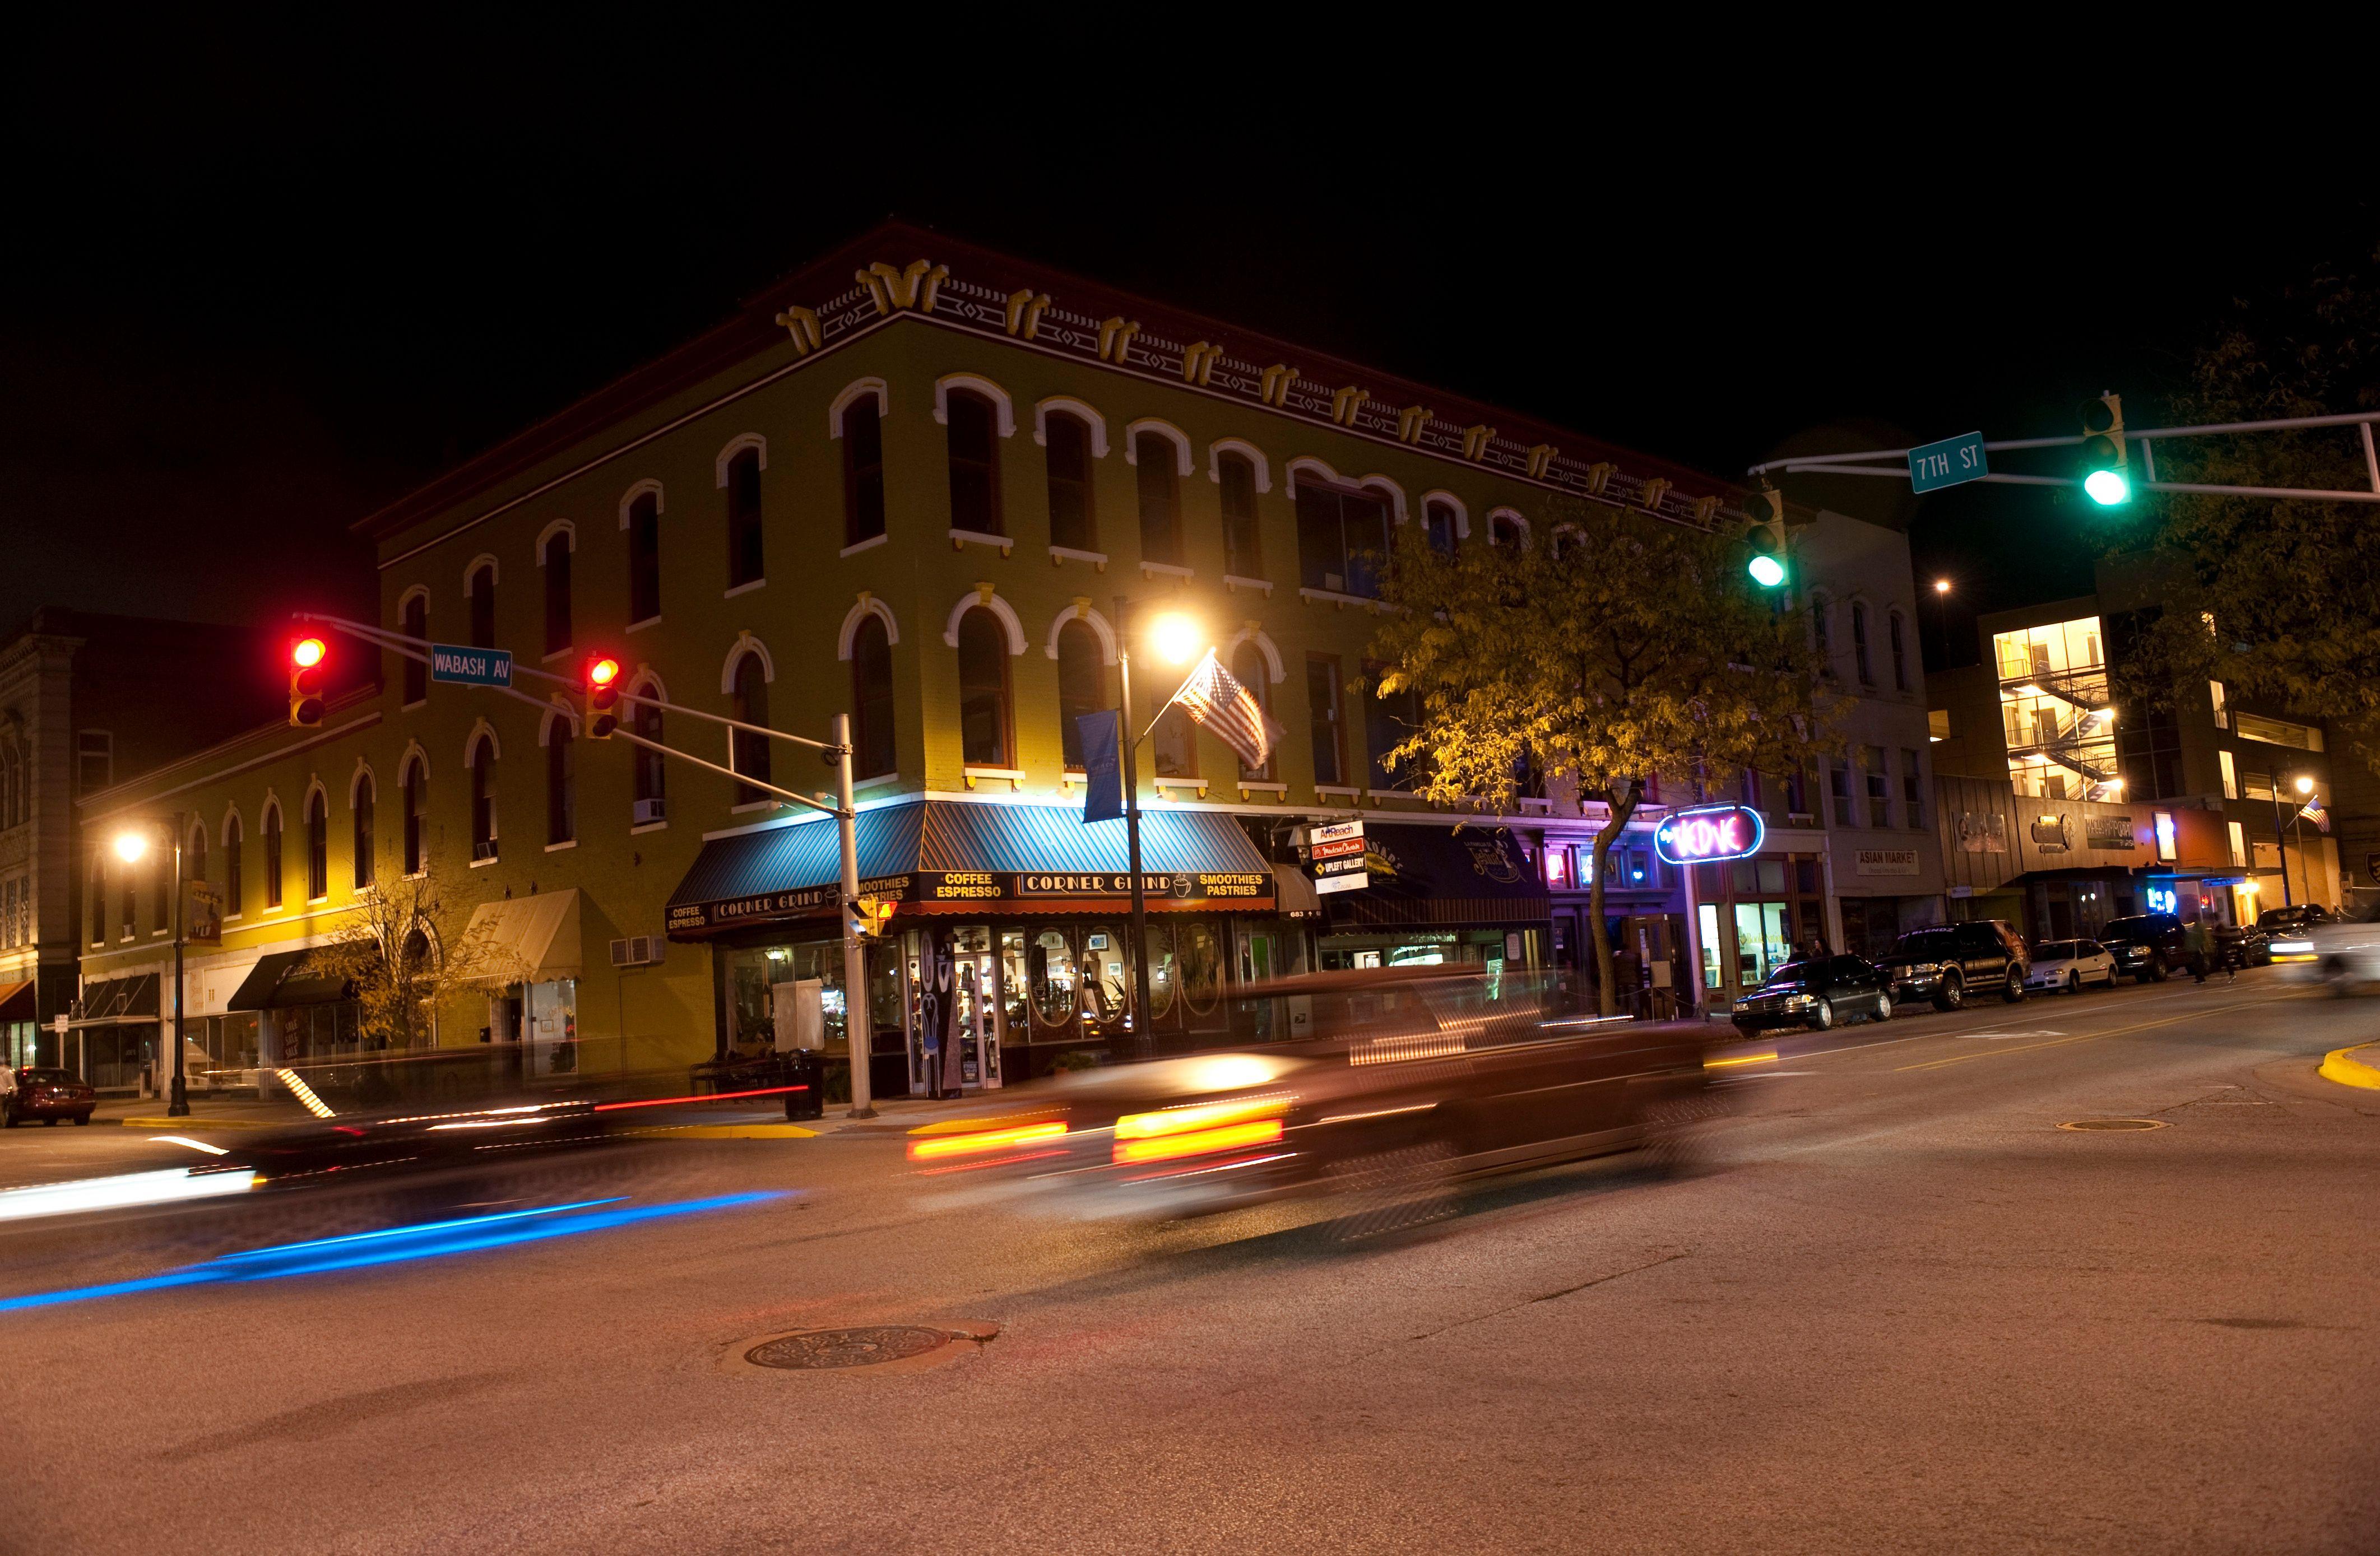 Downtown Terre Haute Kincaid's Salon is on S. 3rd St